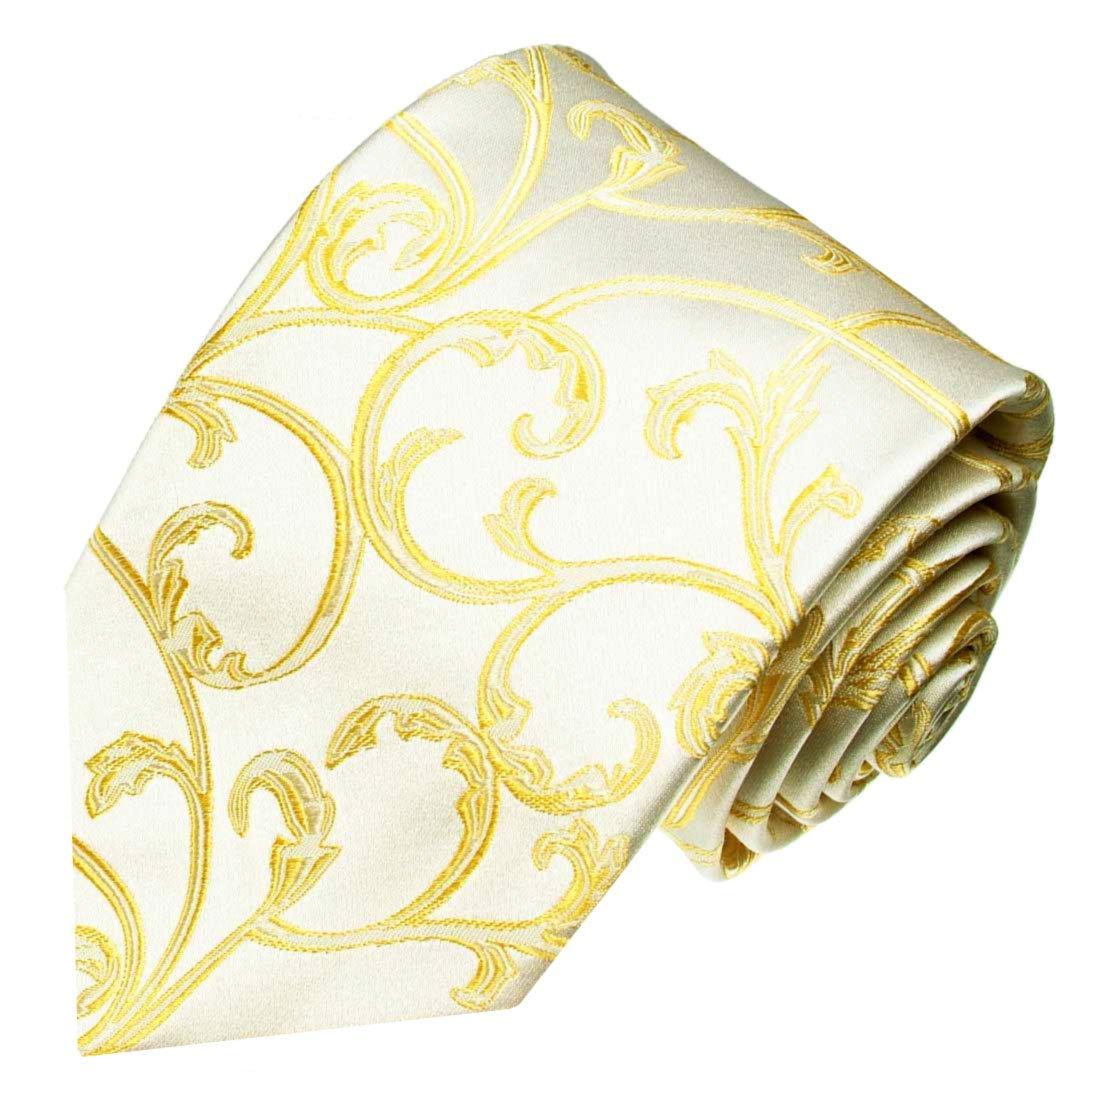 LORENZO CANA - Fijo liche extra larga boda corbata de seda 100 ...